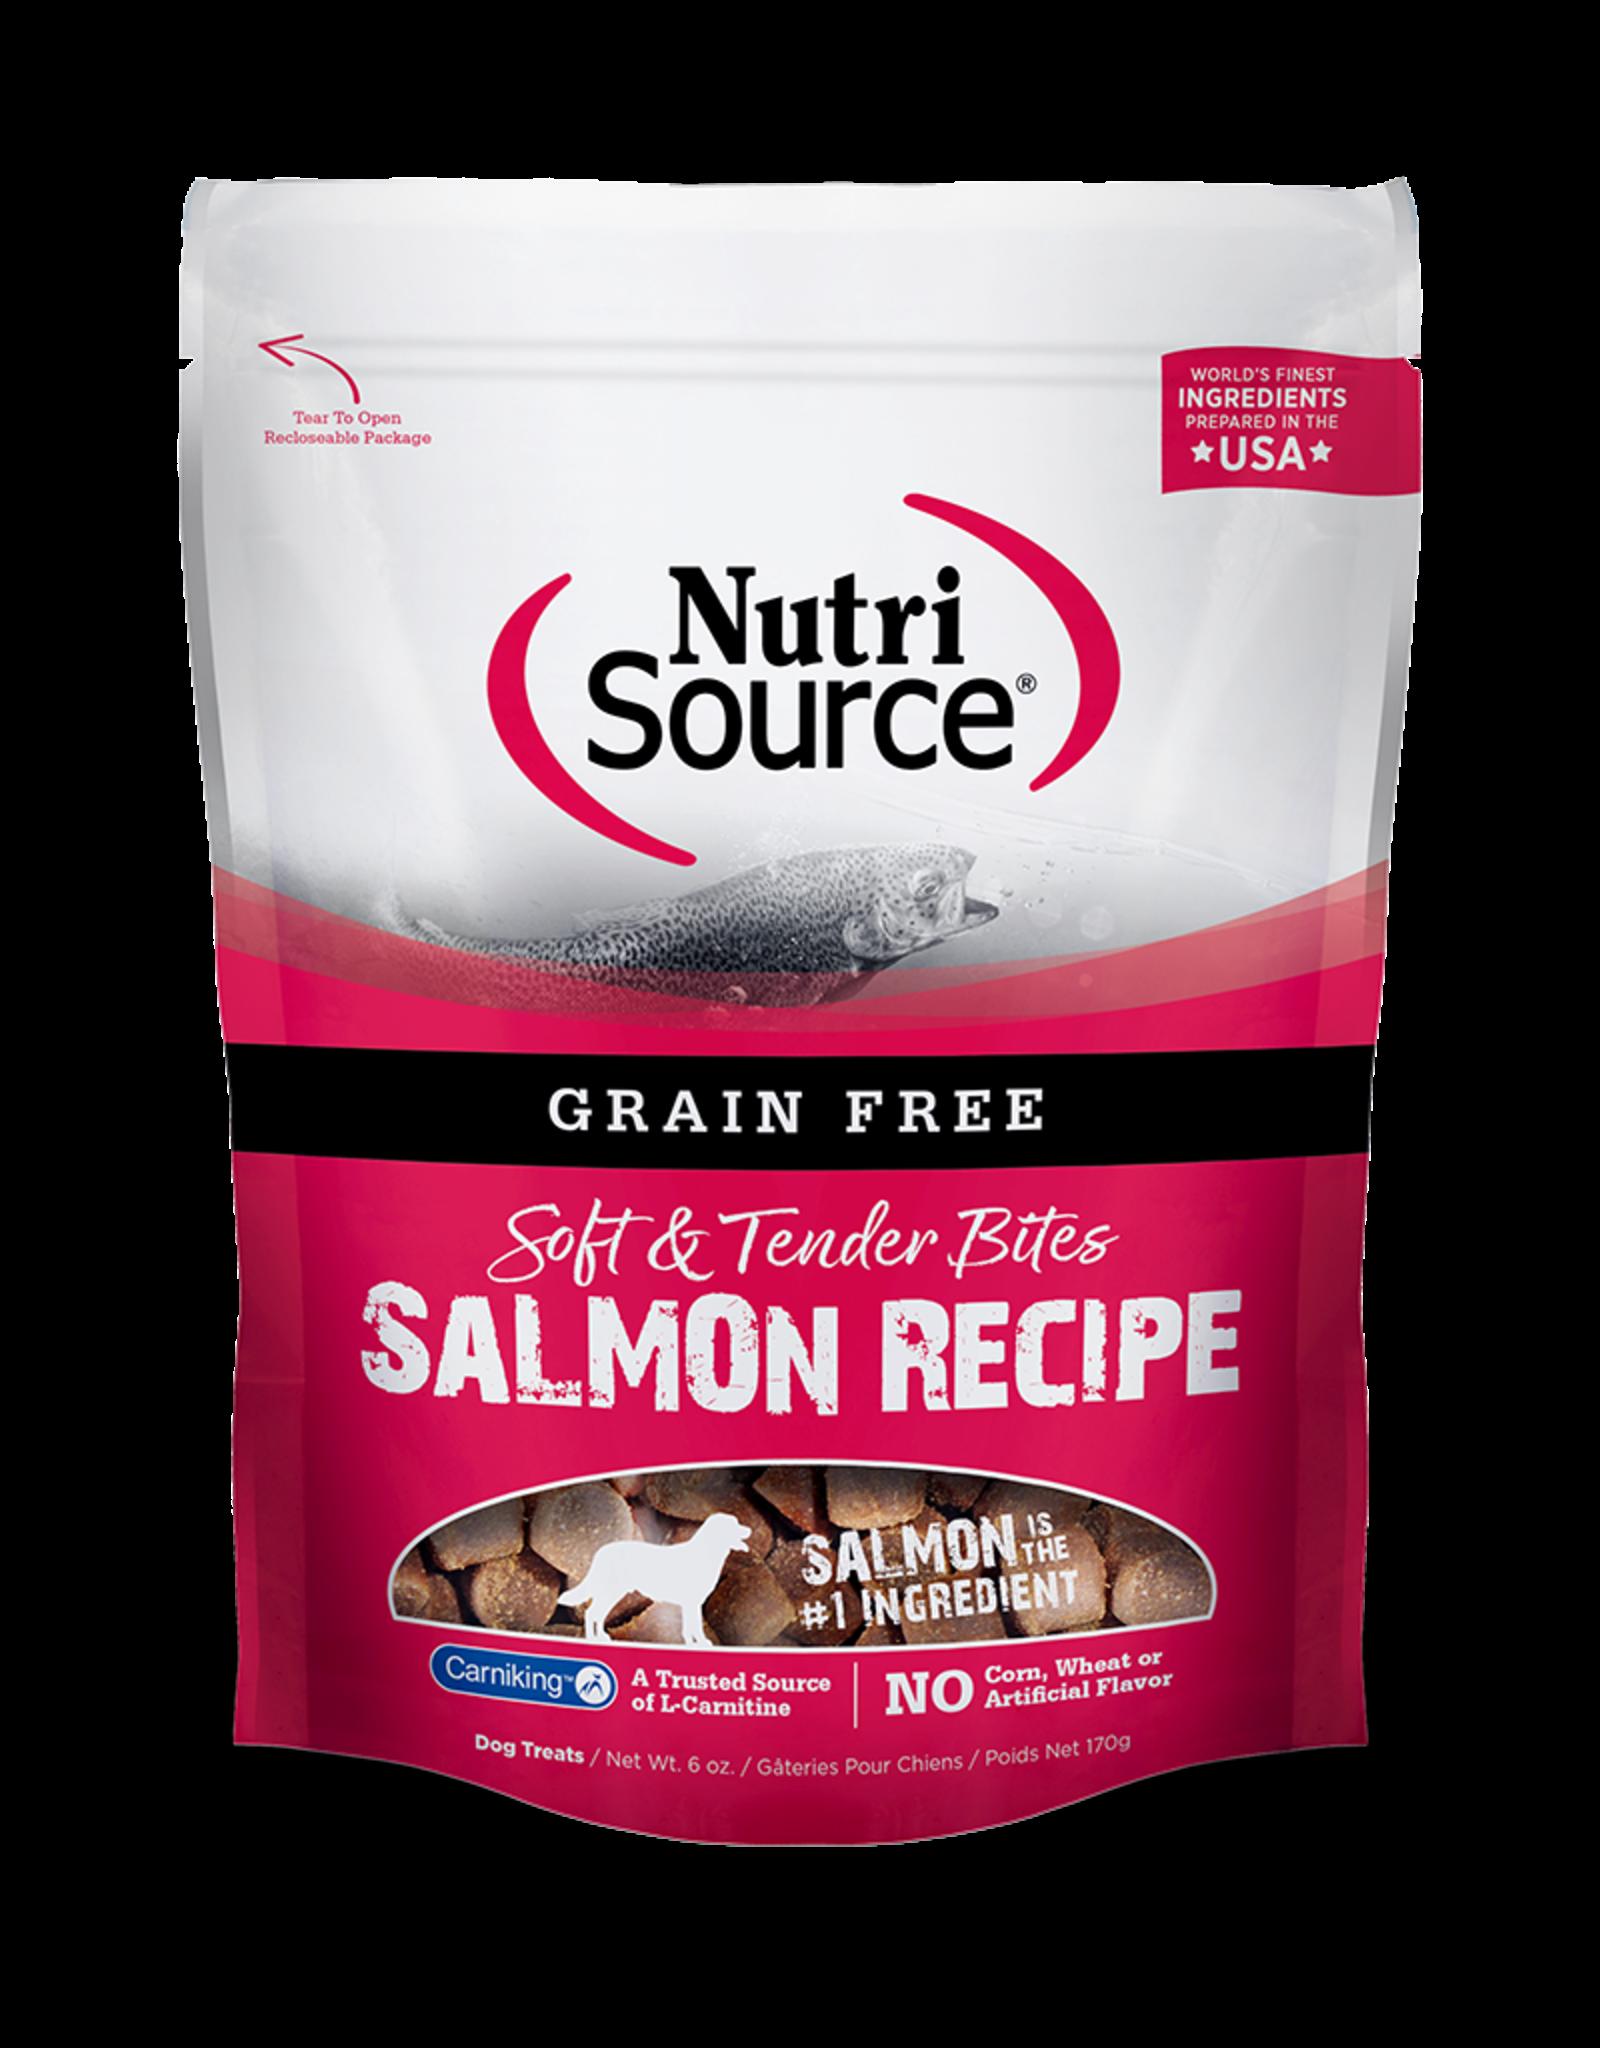 NutriSource Pet Foods NUTRISOURCE SOFT & MOIST BITES SALMON RECIPE 6OZ